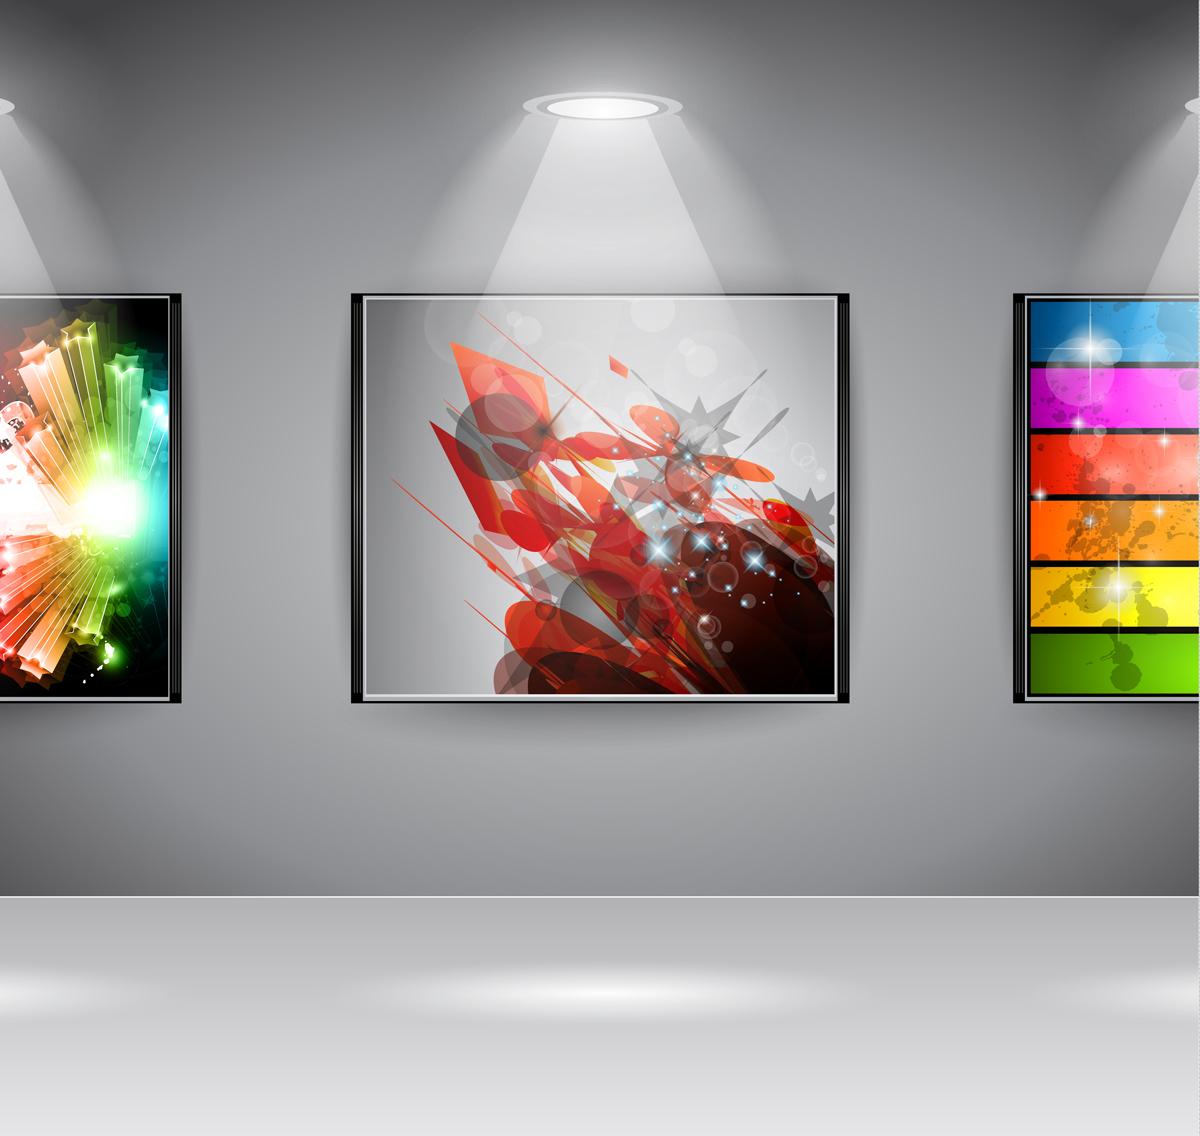 Accent lighting adds drama